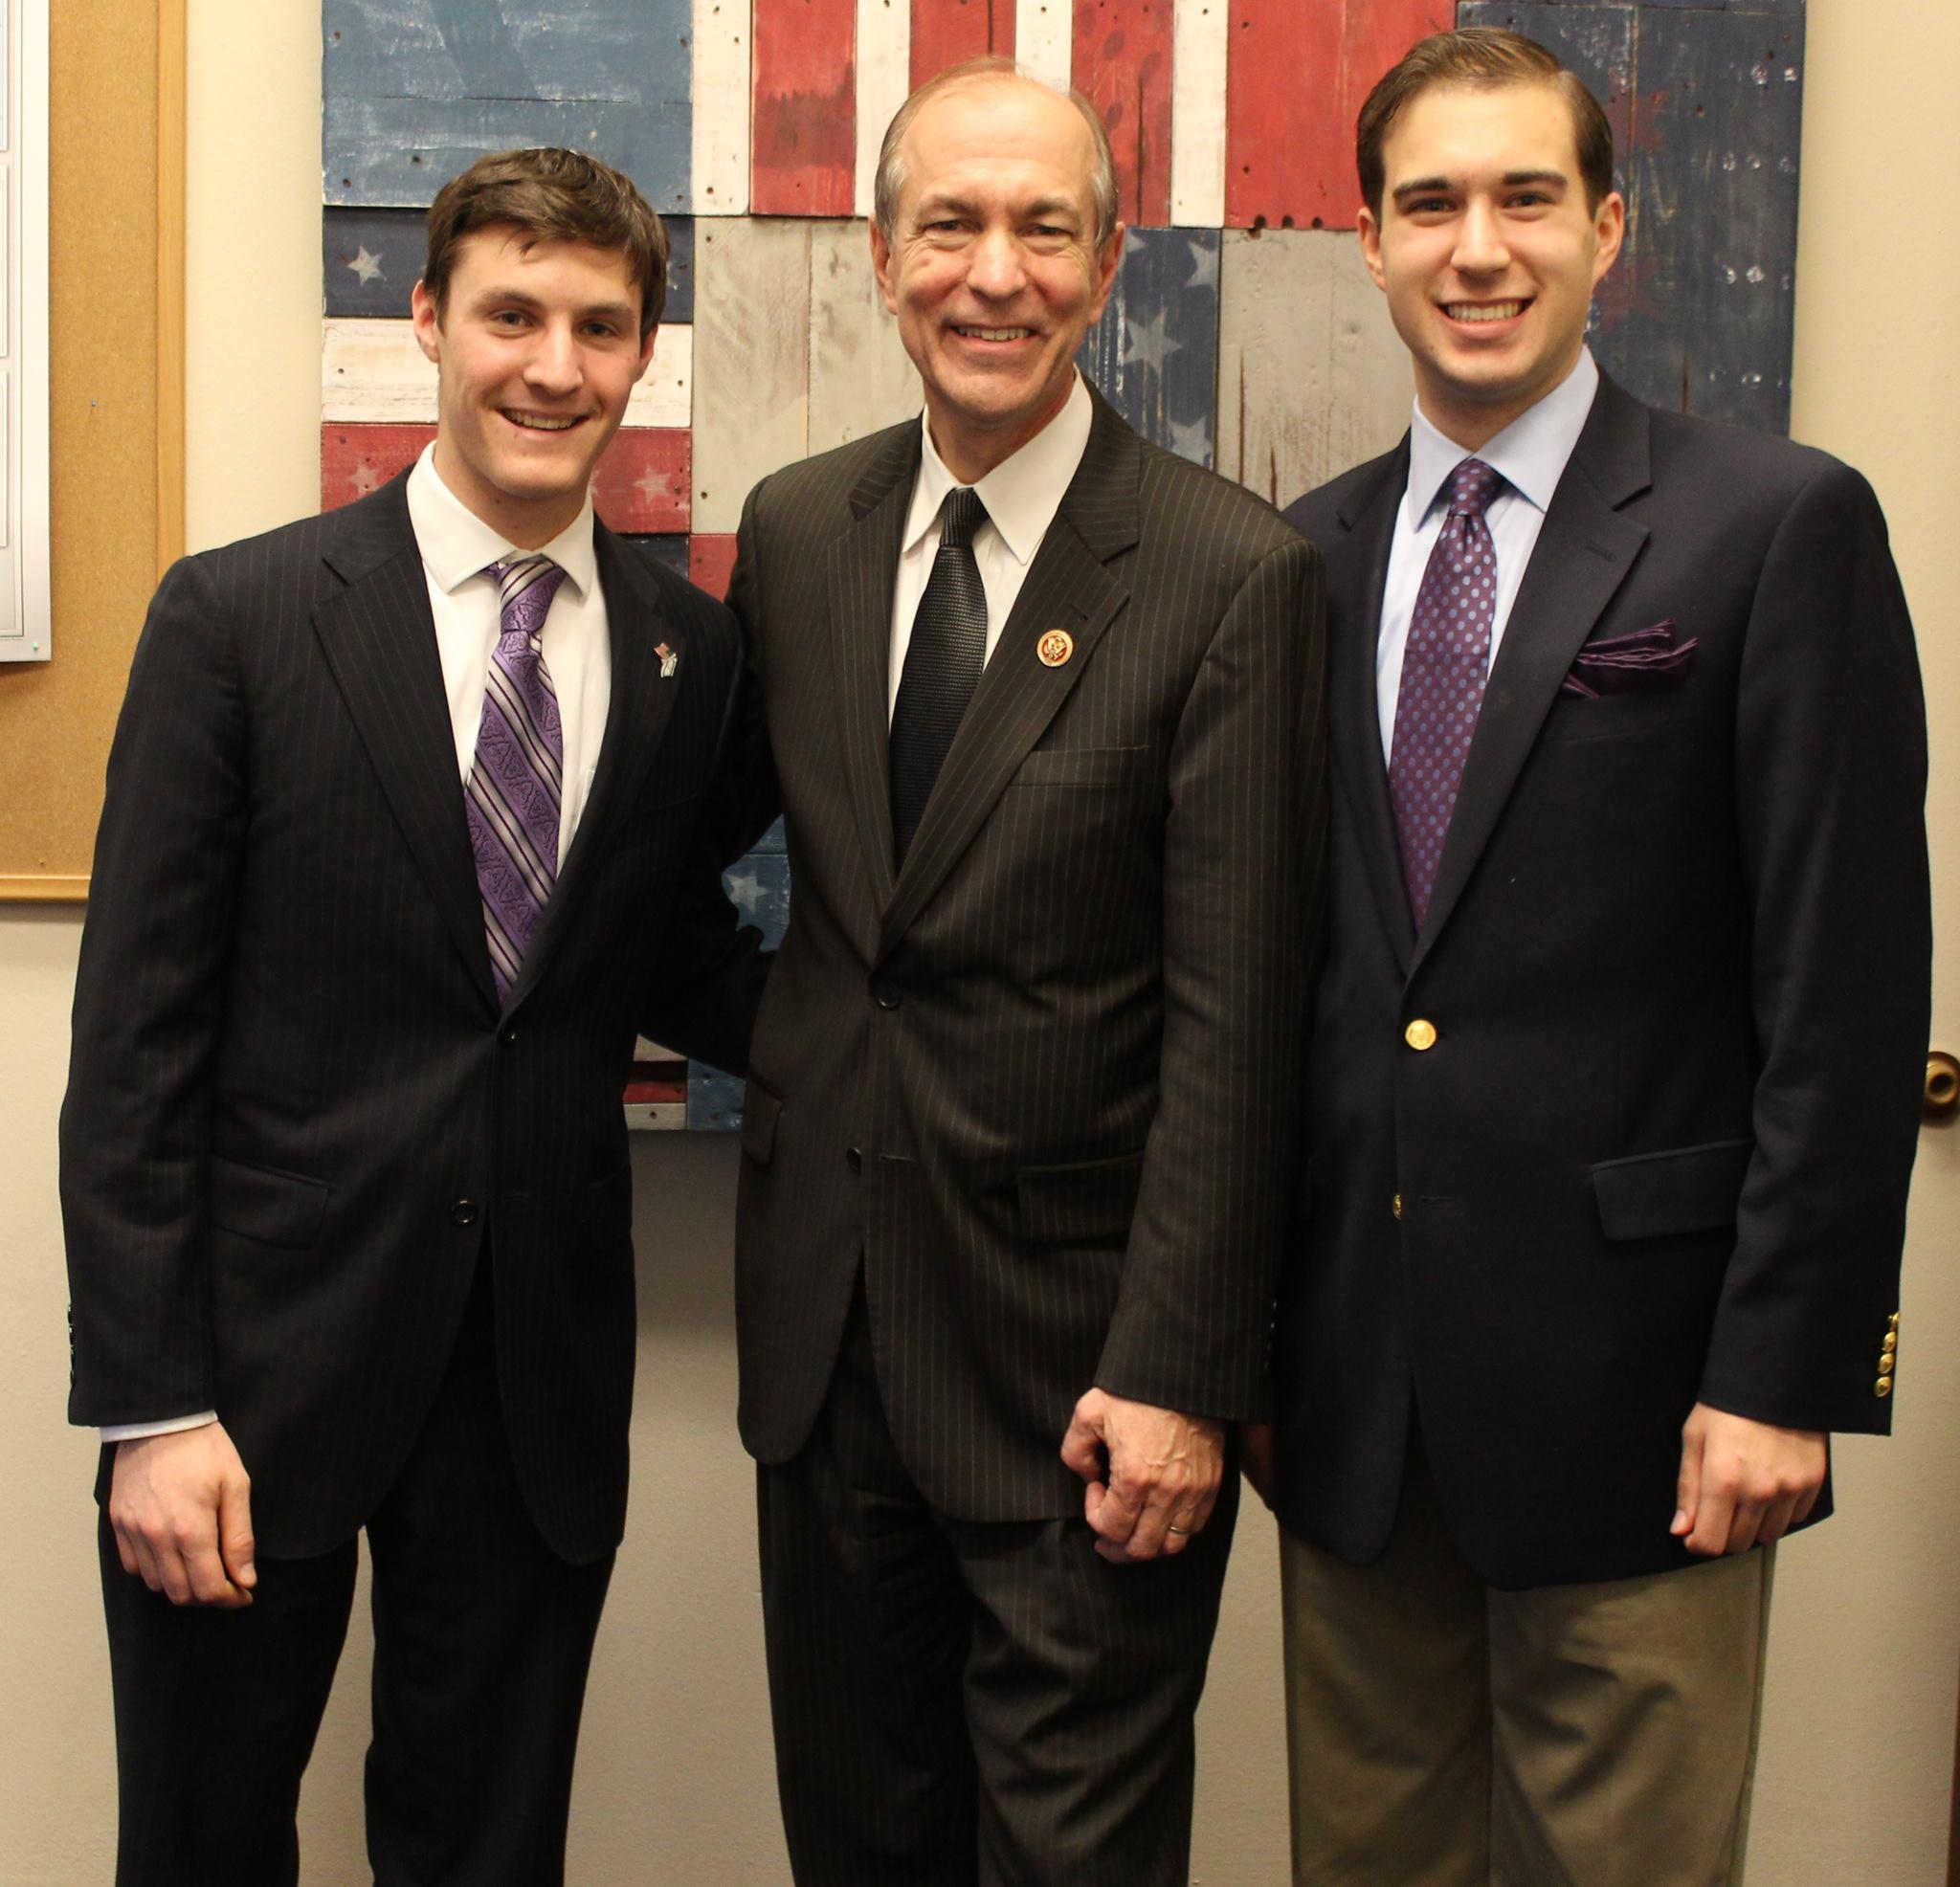 With former Congressman Scott Garrett (R-NJ), November 2013